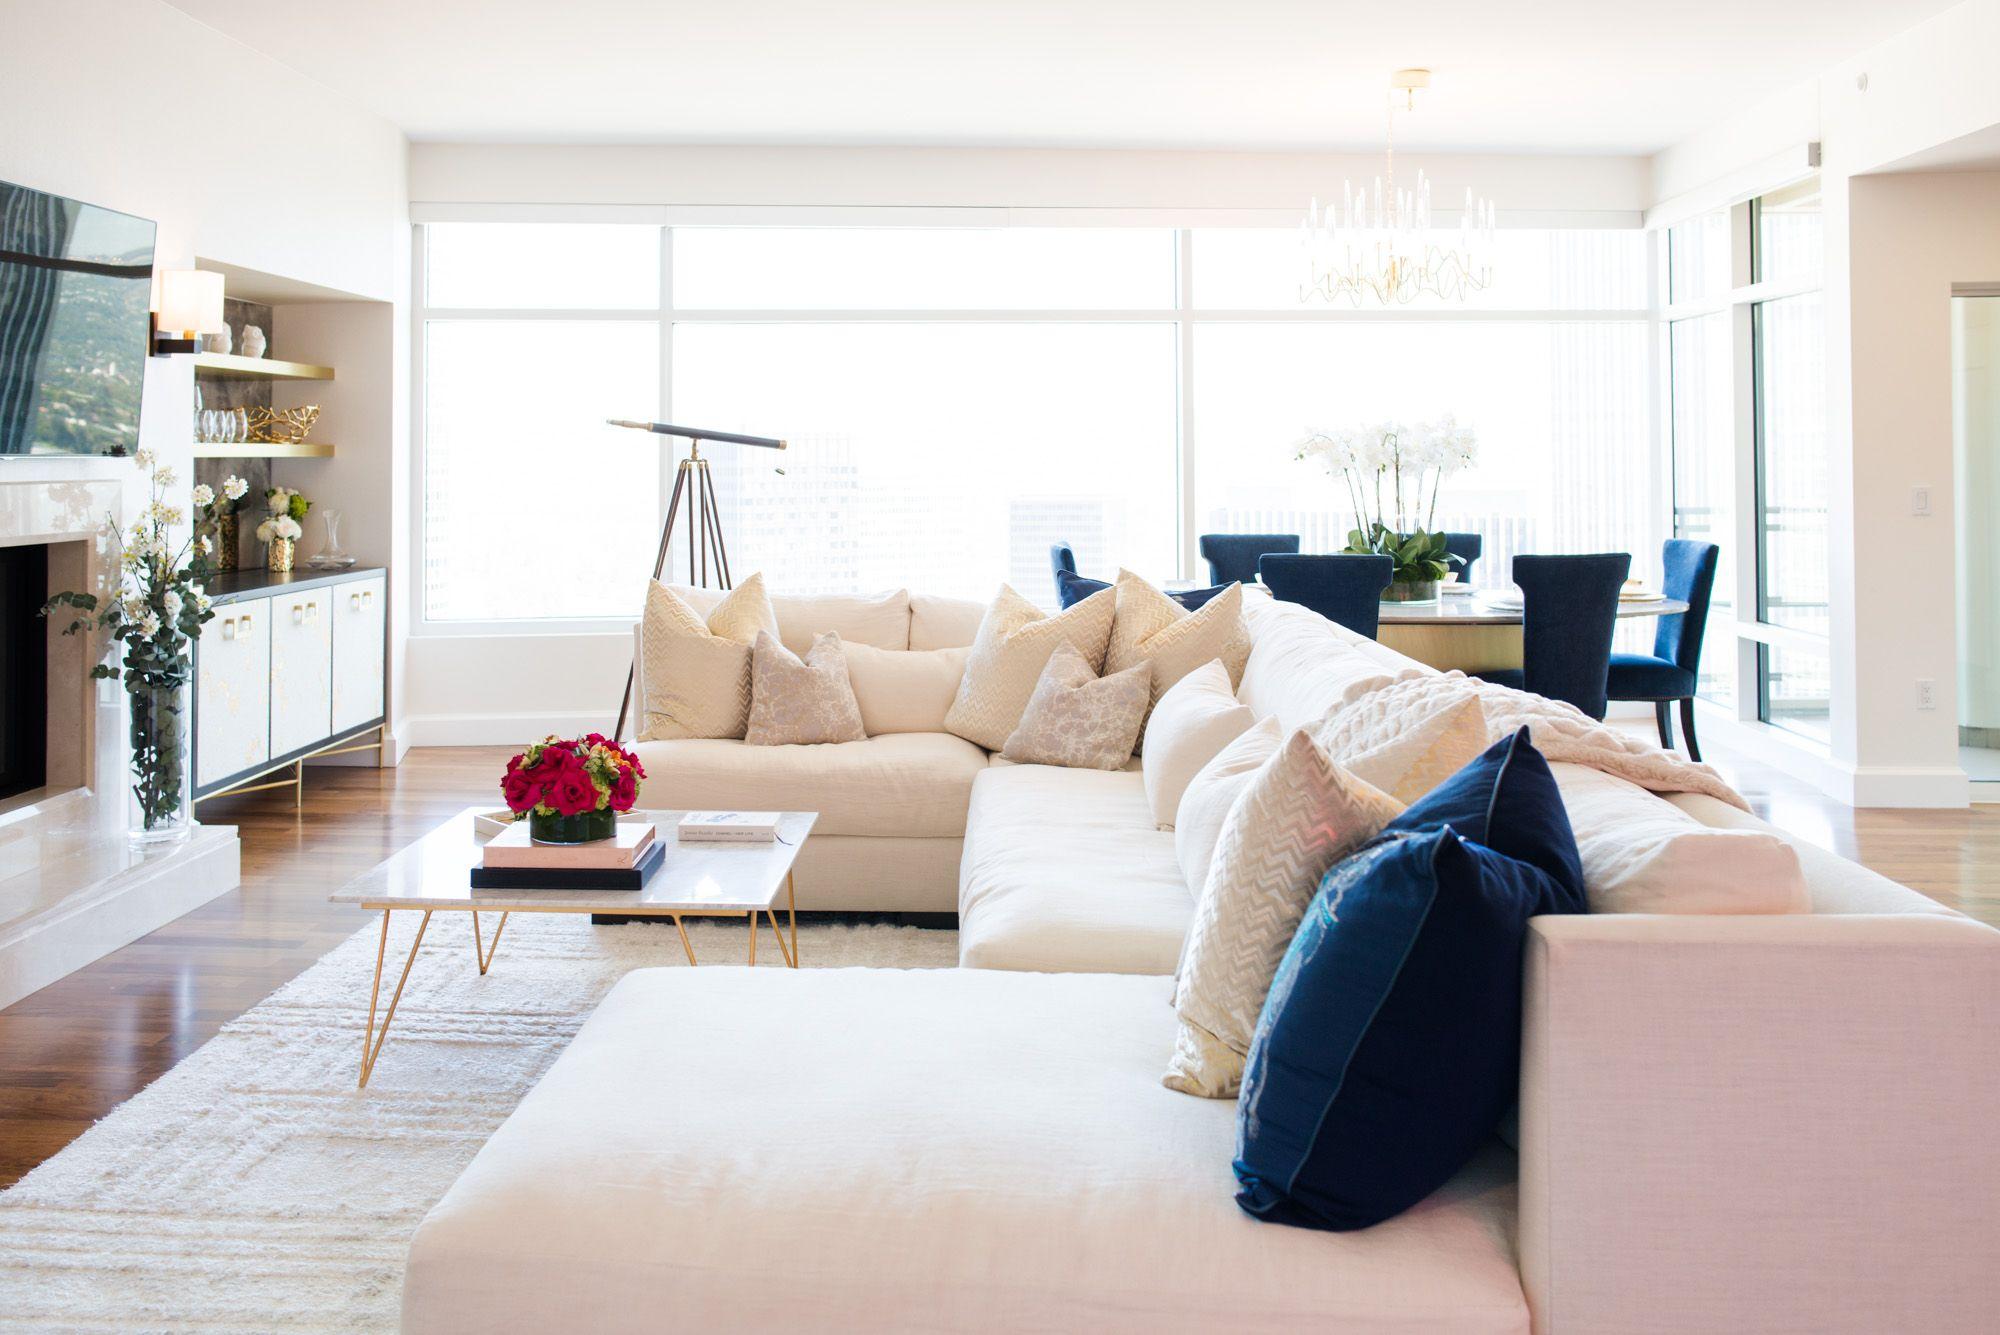 Studio Lifestyle // Family Room | Family Rooms | Pinterest | Studio ...